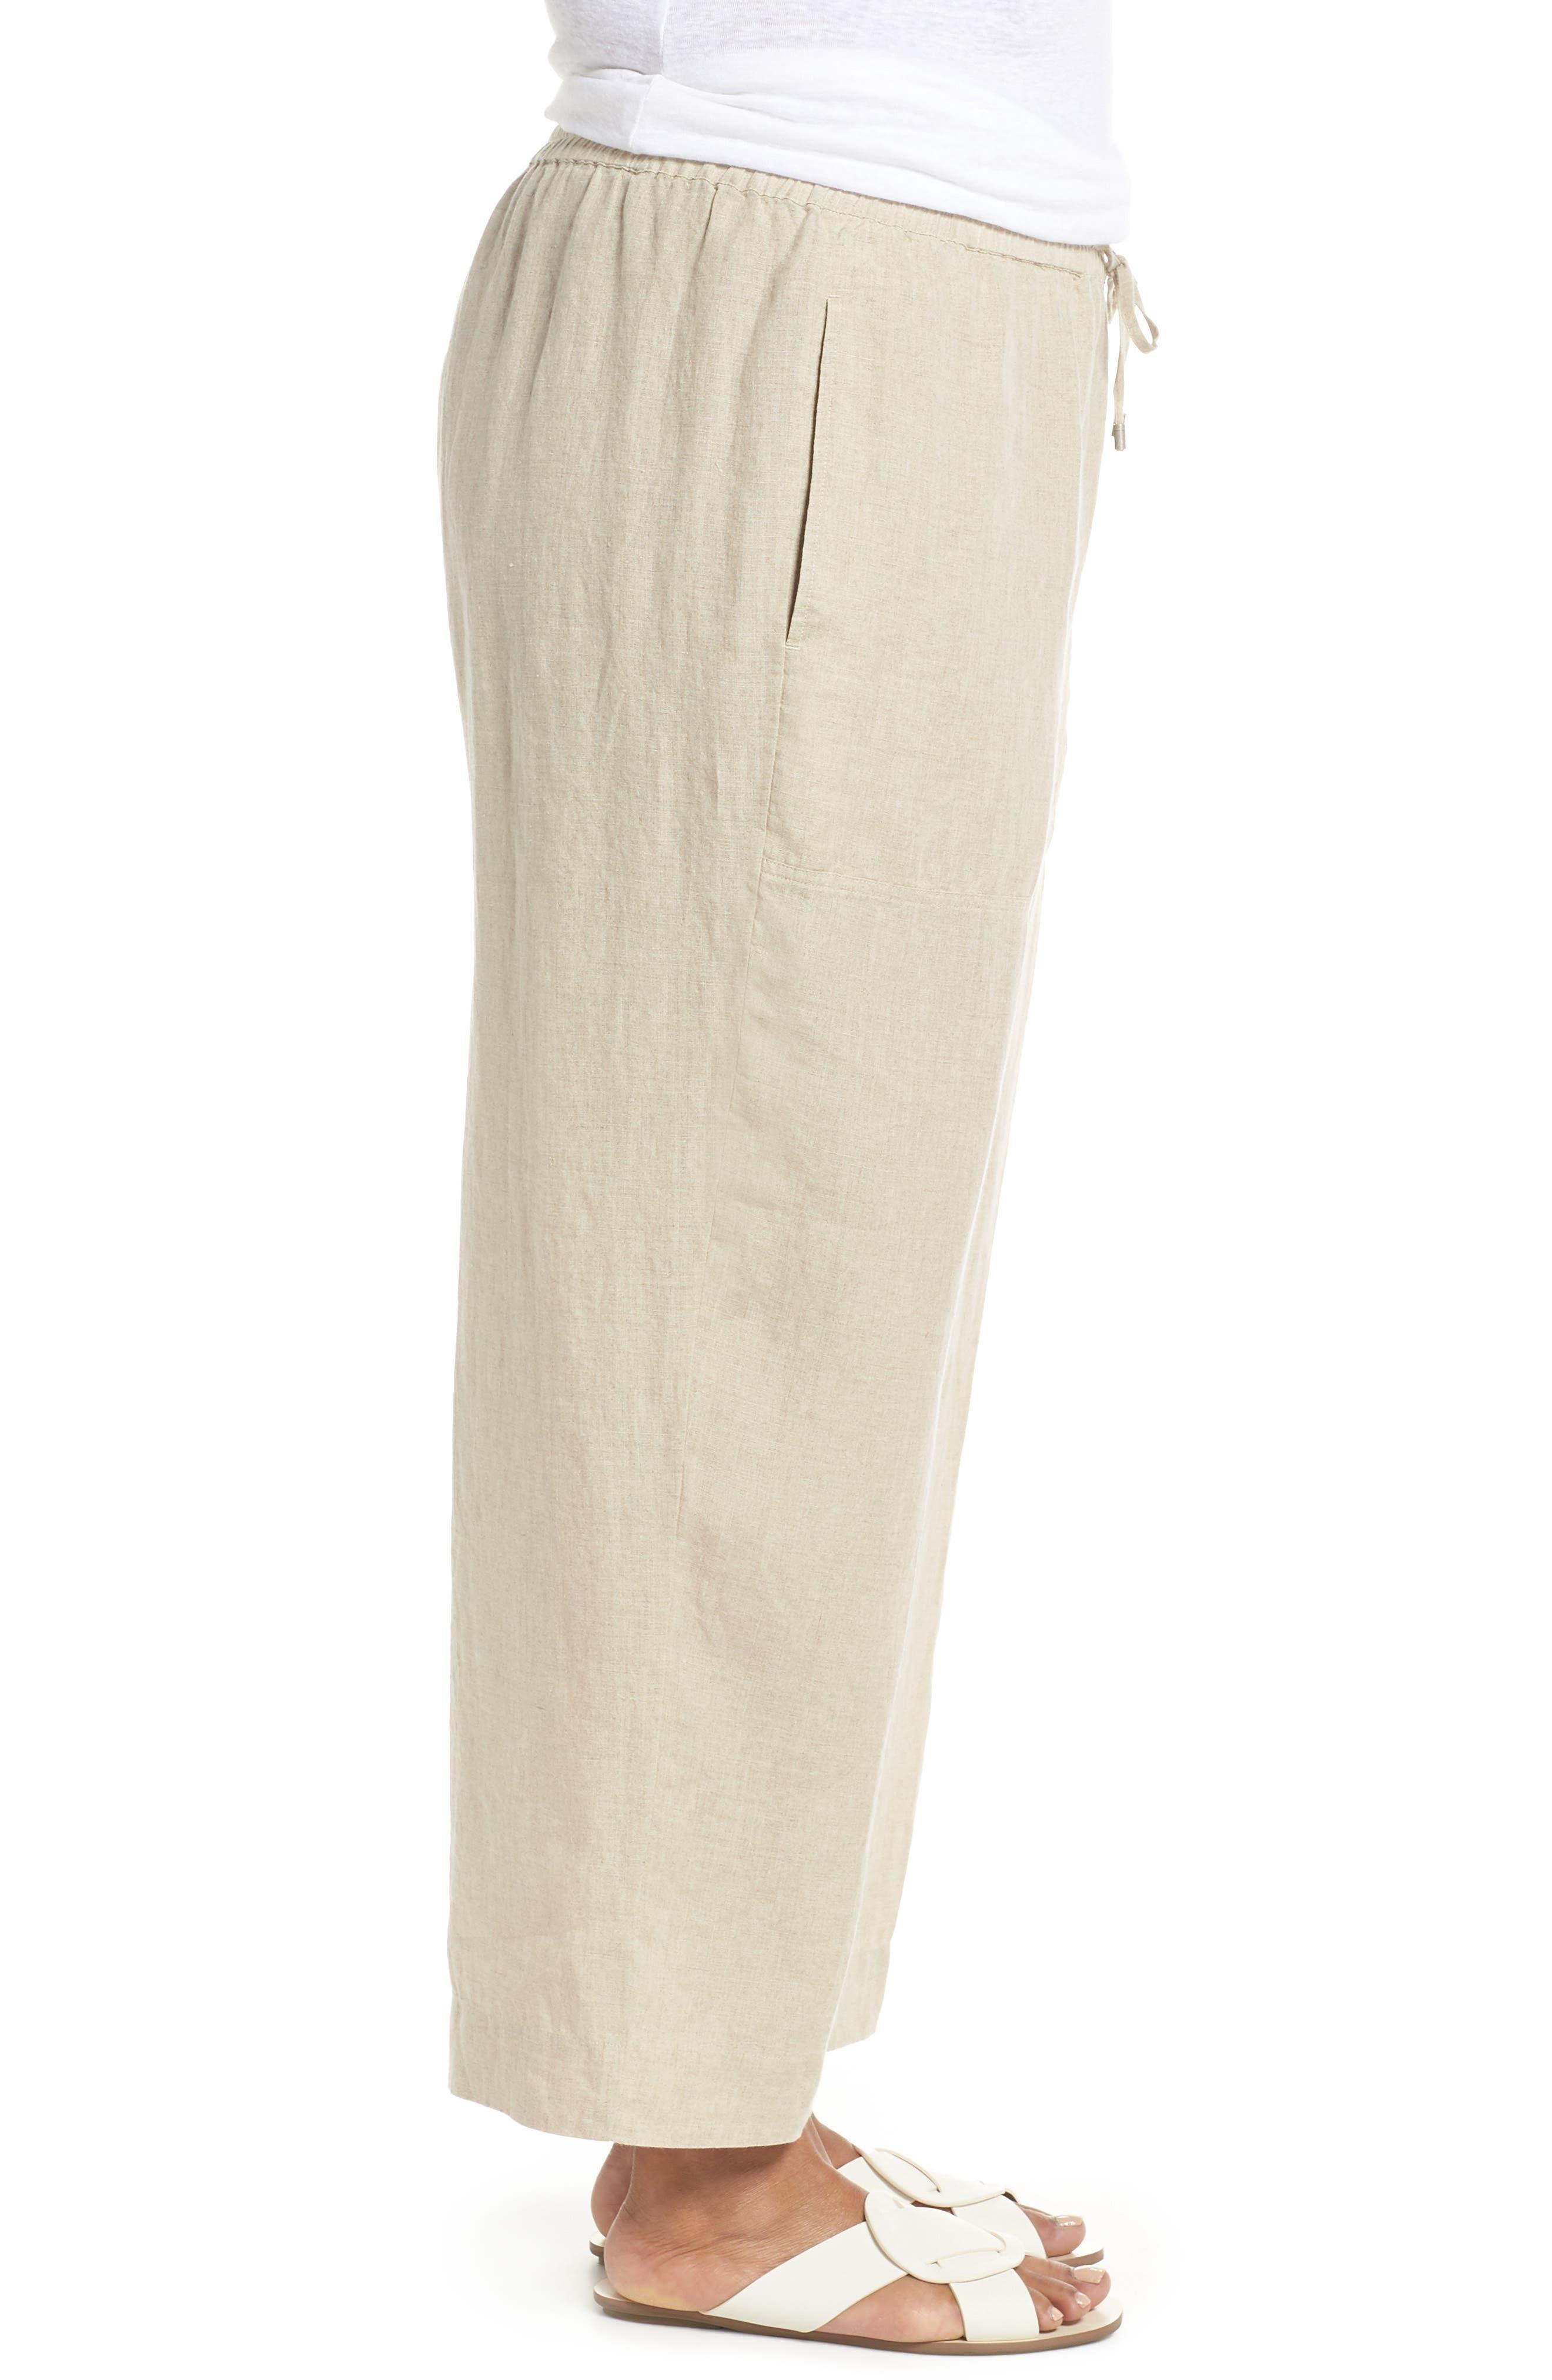 Organic Linen Ankle Pants,                             Alternate thumbnail 3, color,                             Undyed Natural